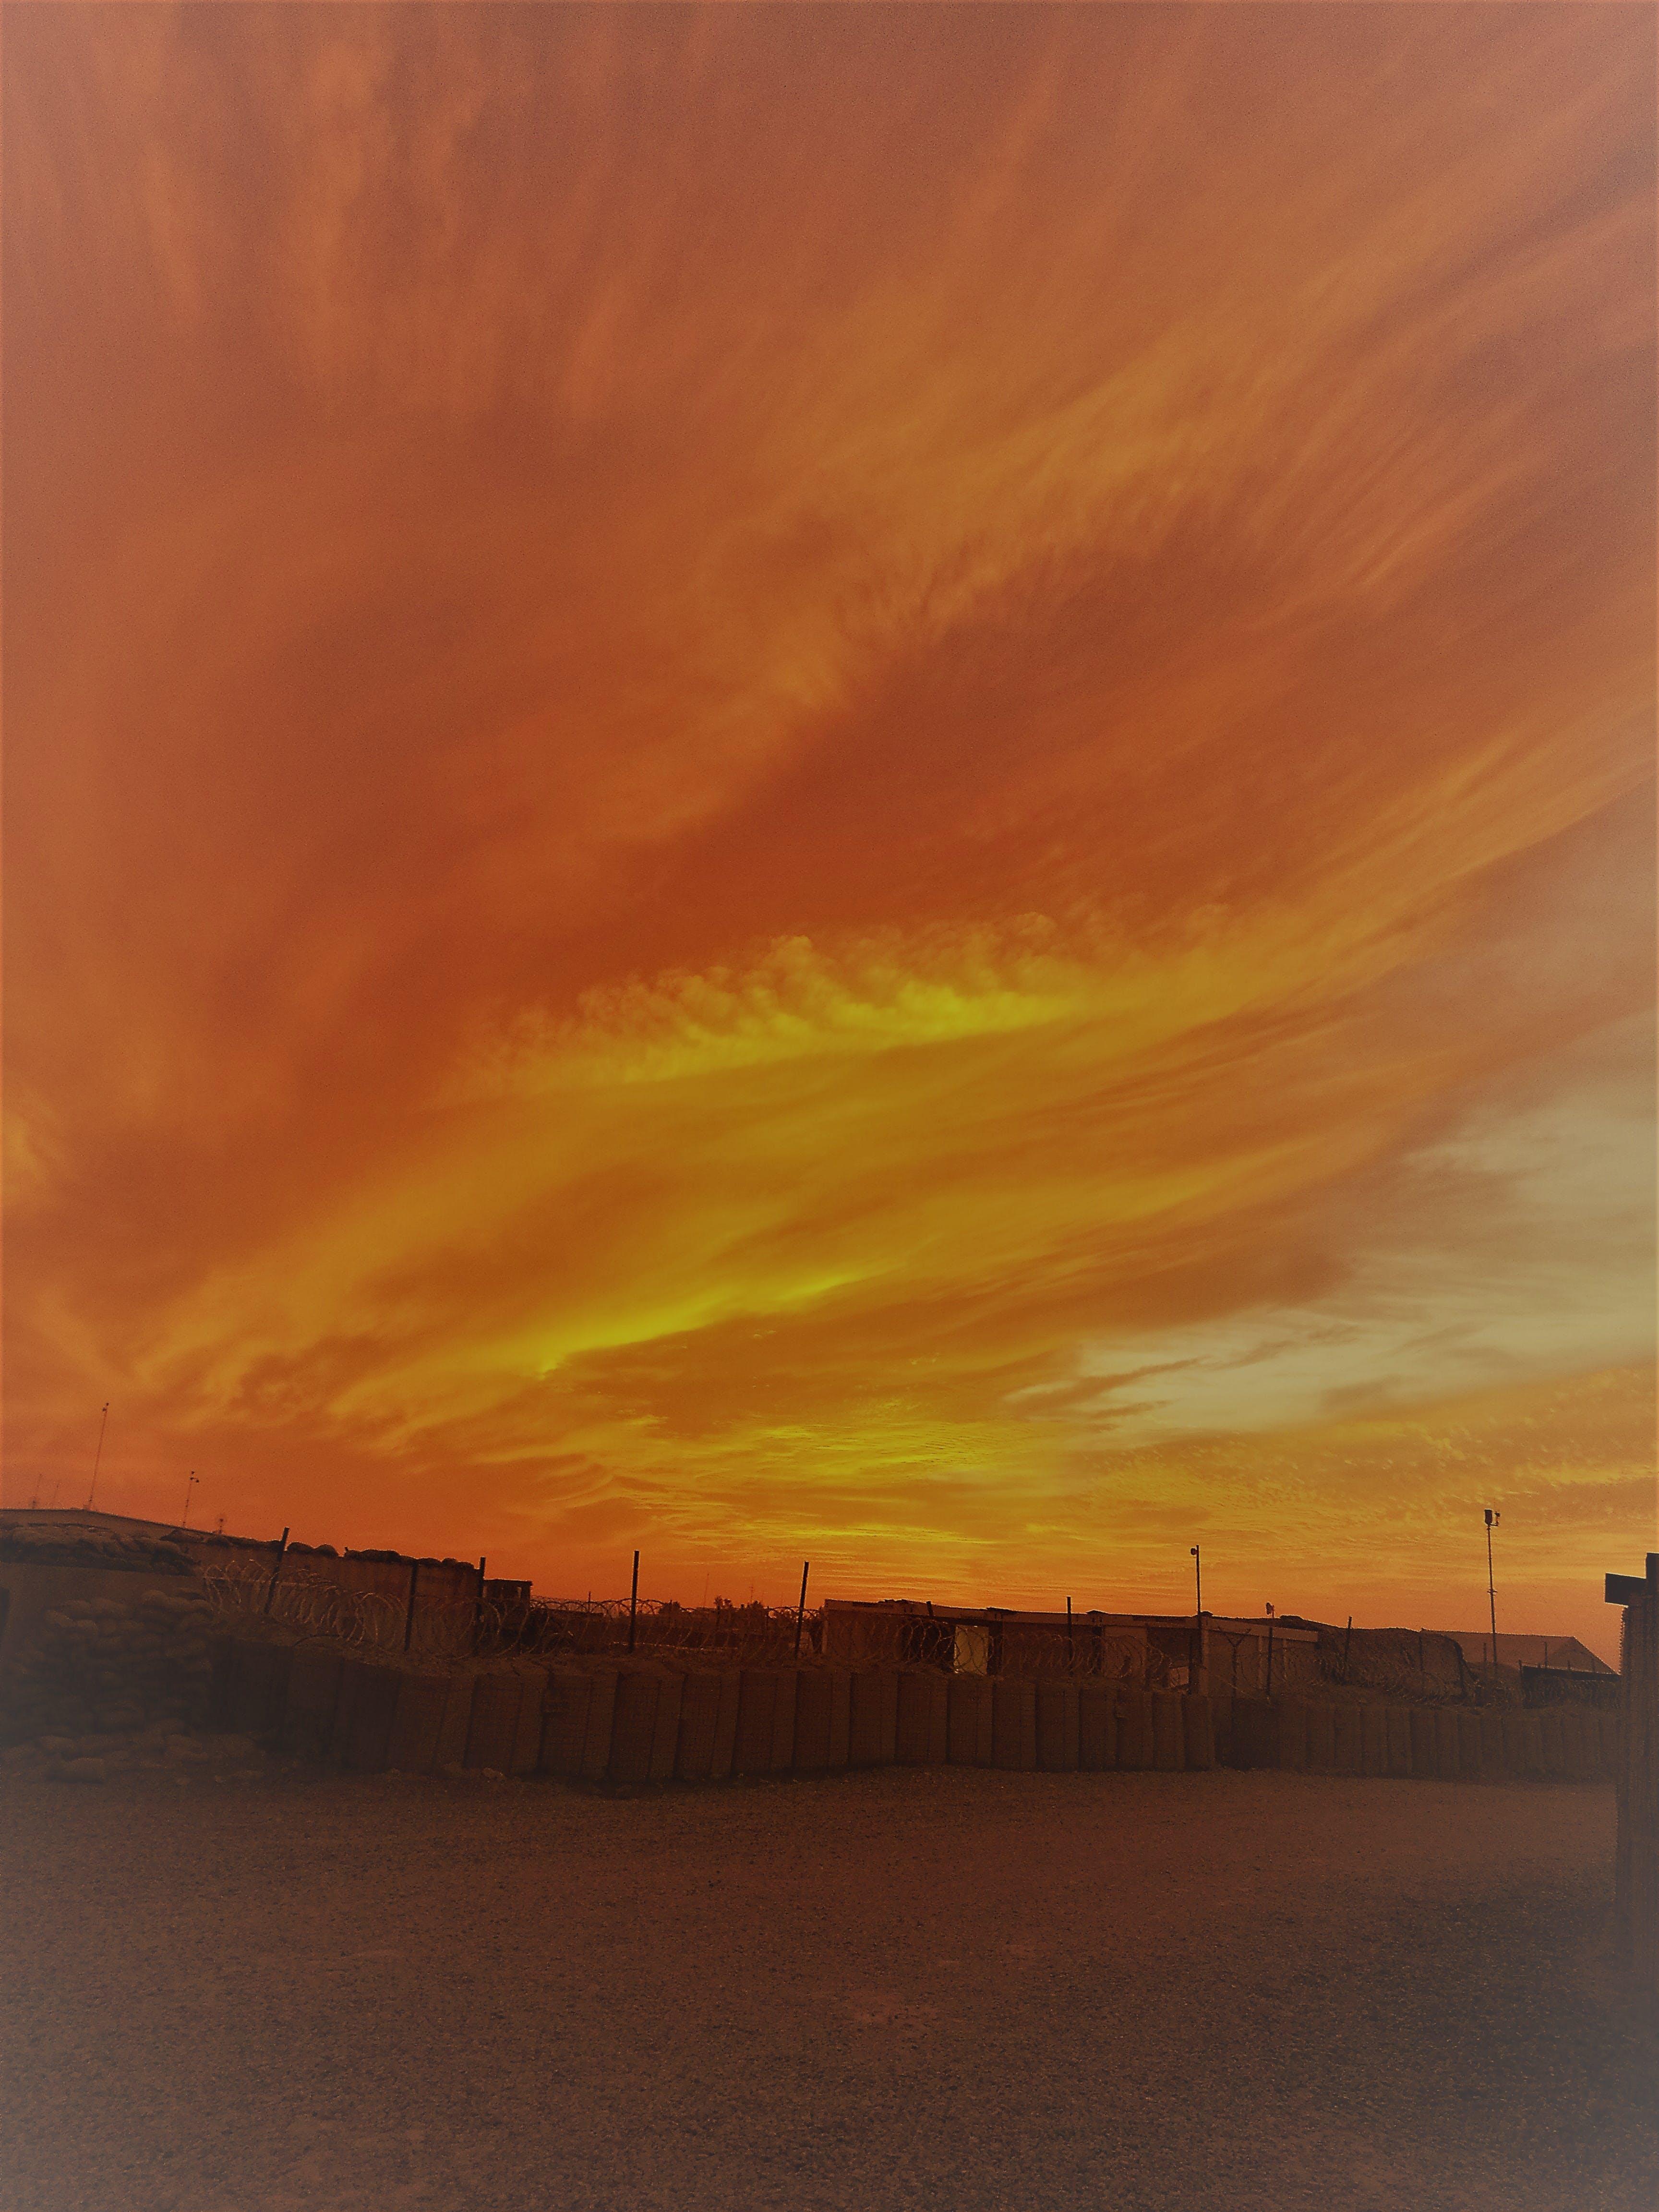 Free stock photo of desert, golden sunset, iraq, sunset